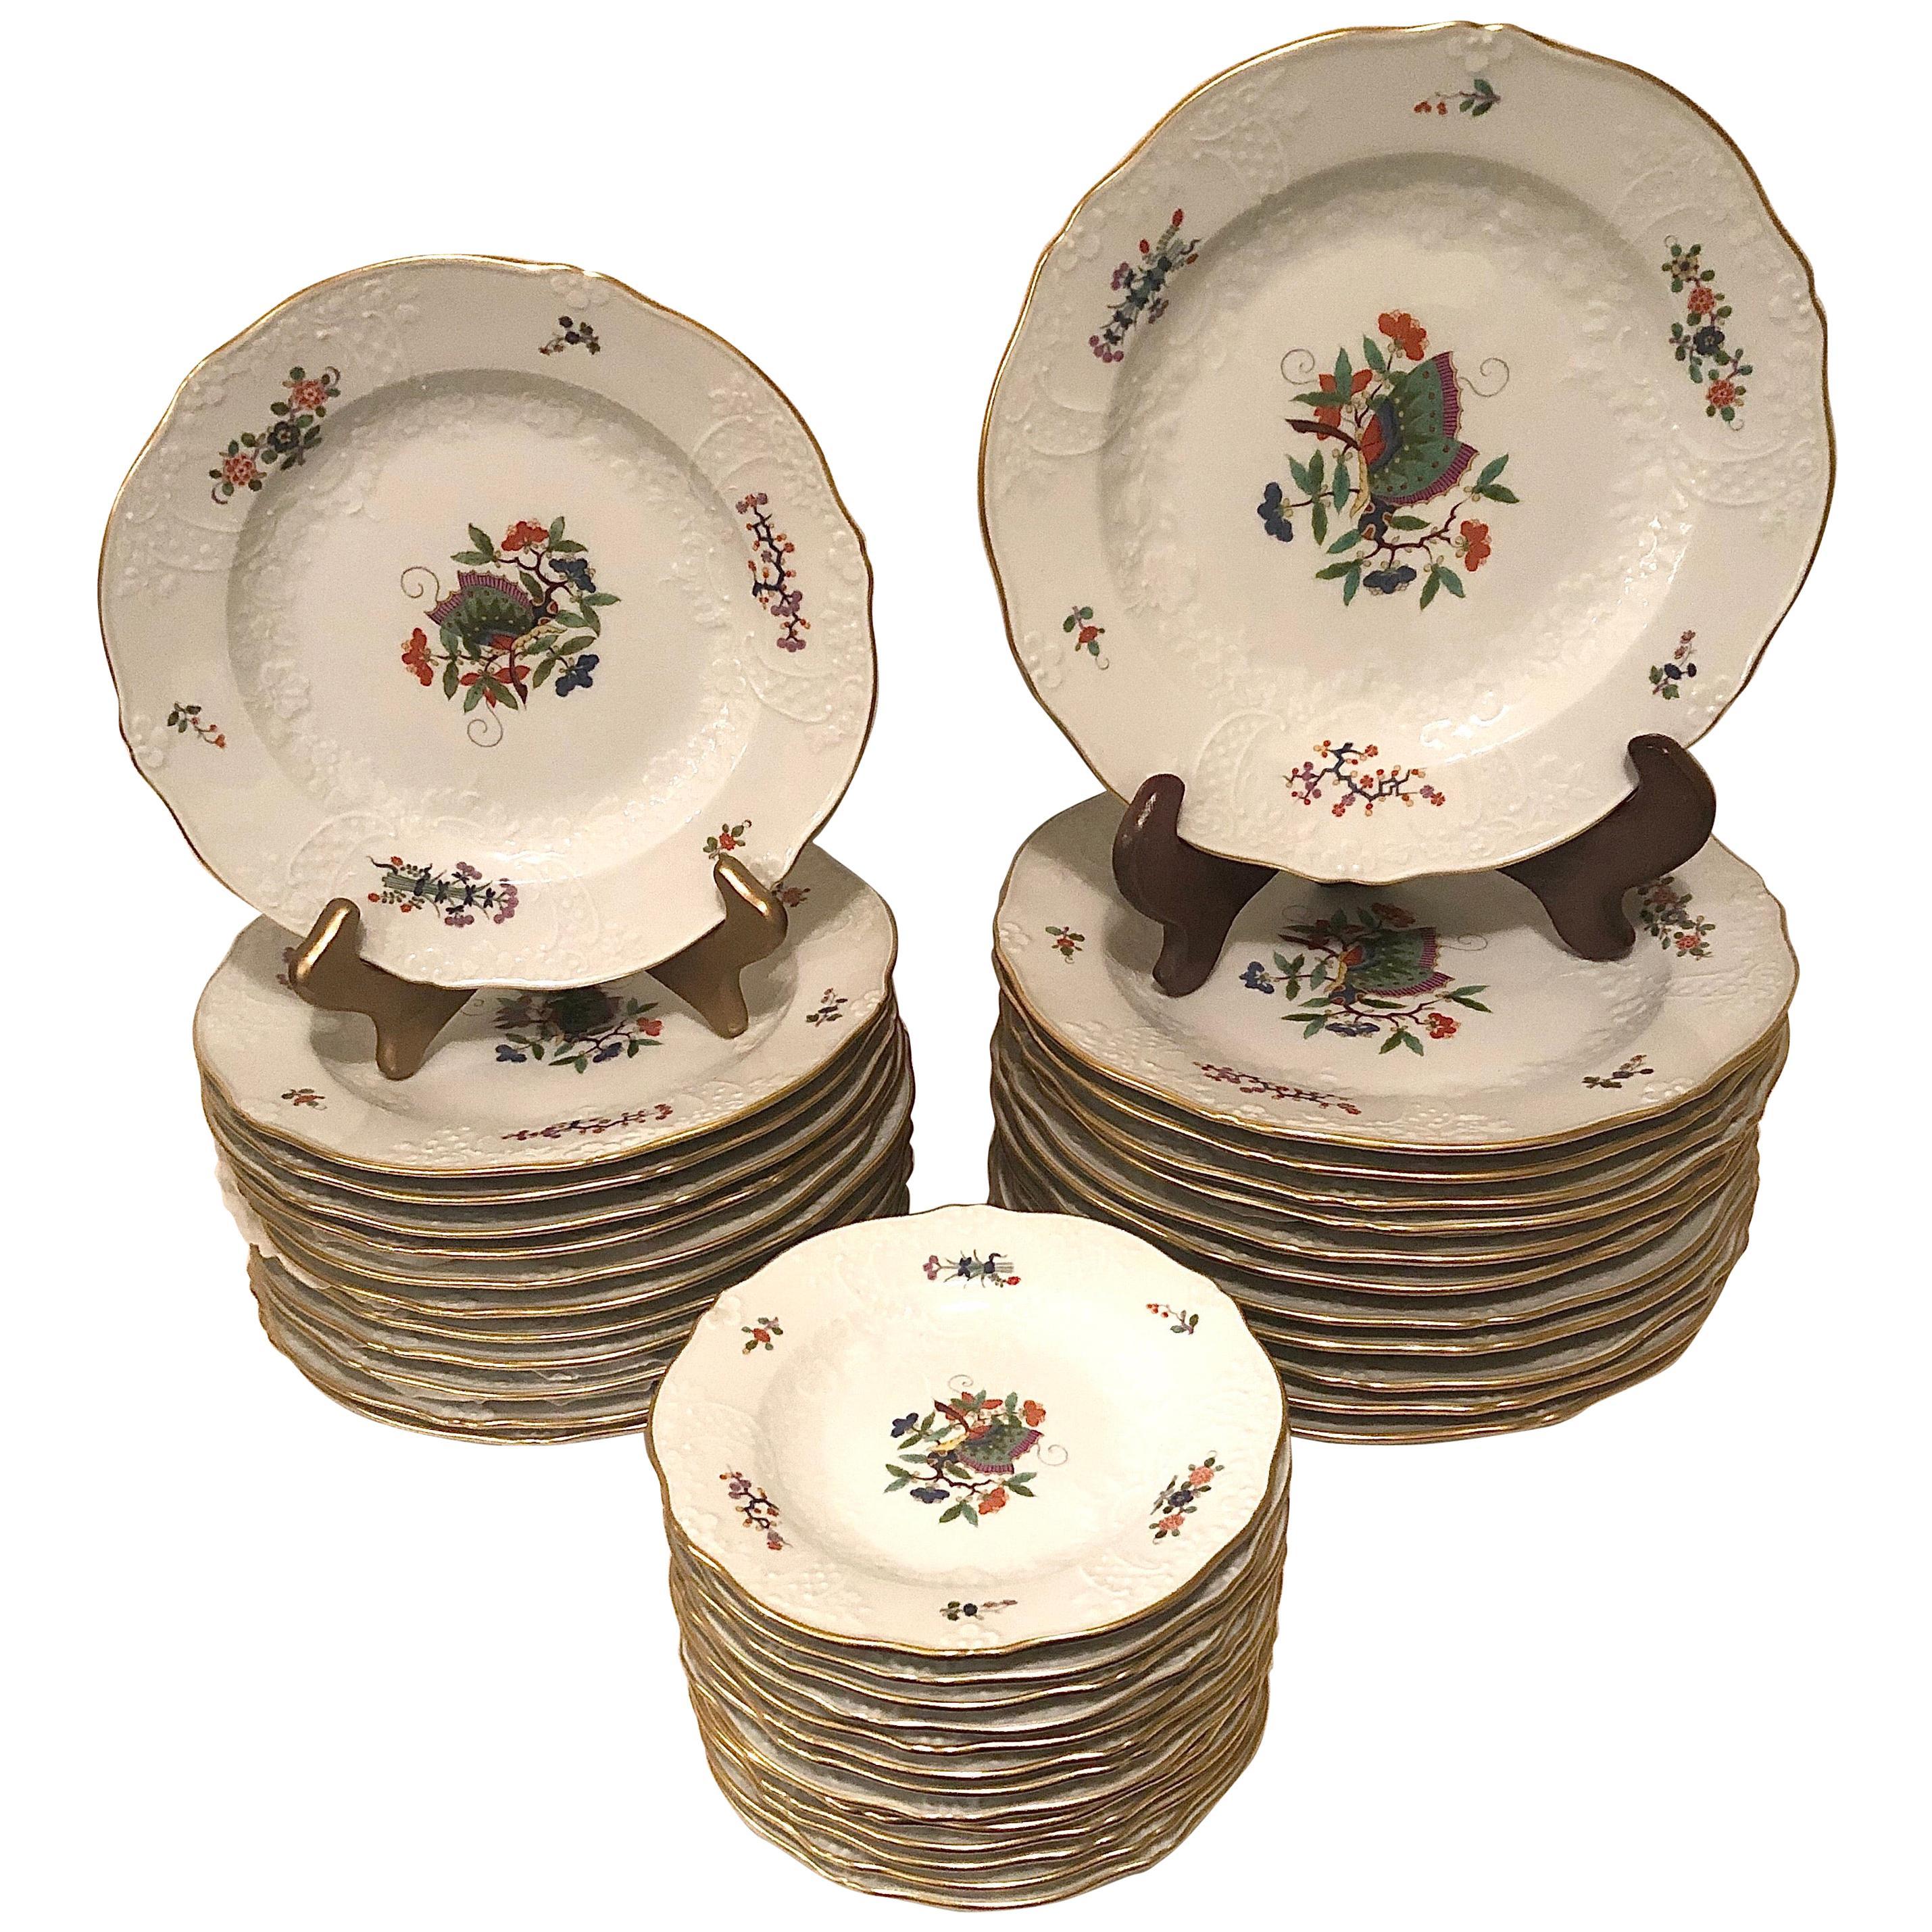 Meissen Chinese Butterfly or Schmetterling Pattern Dinner Service for Twelve